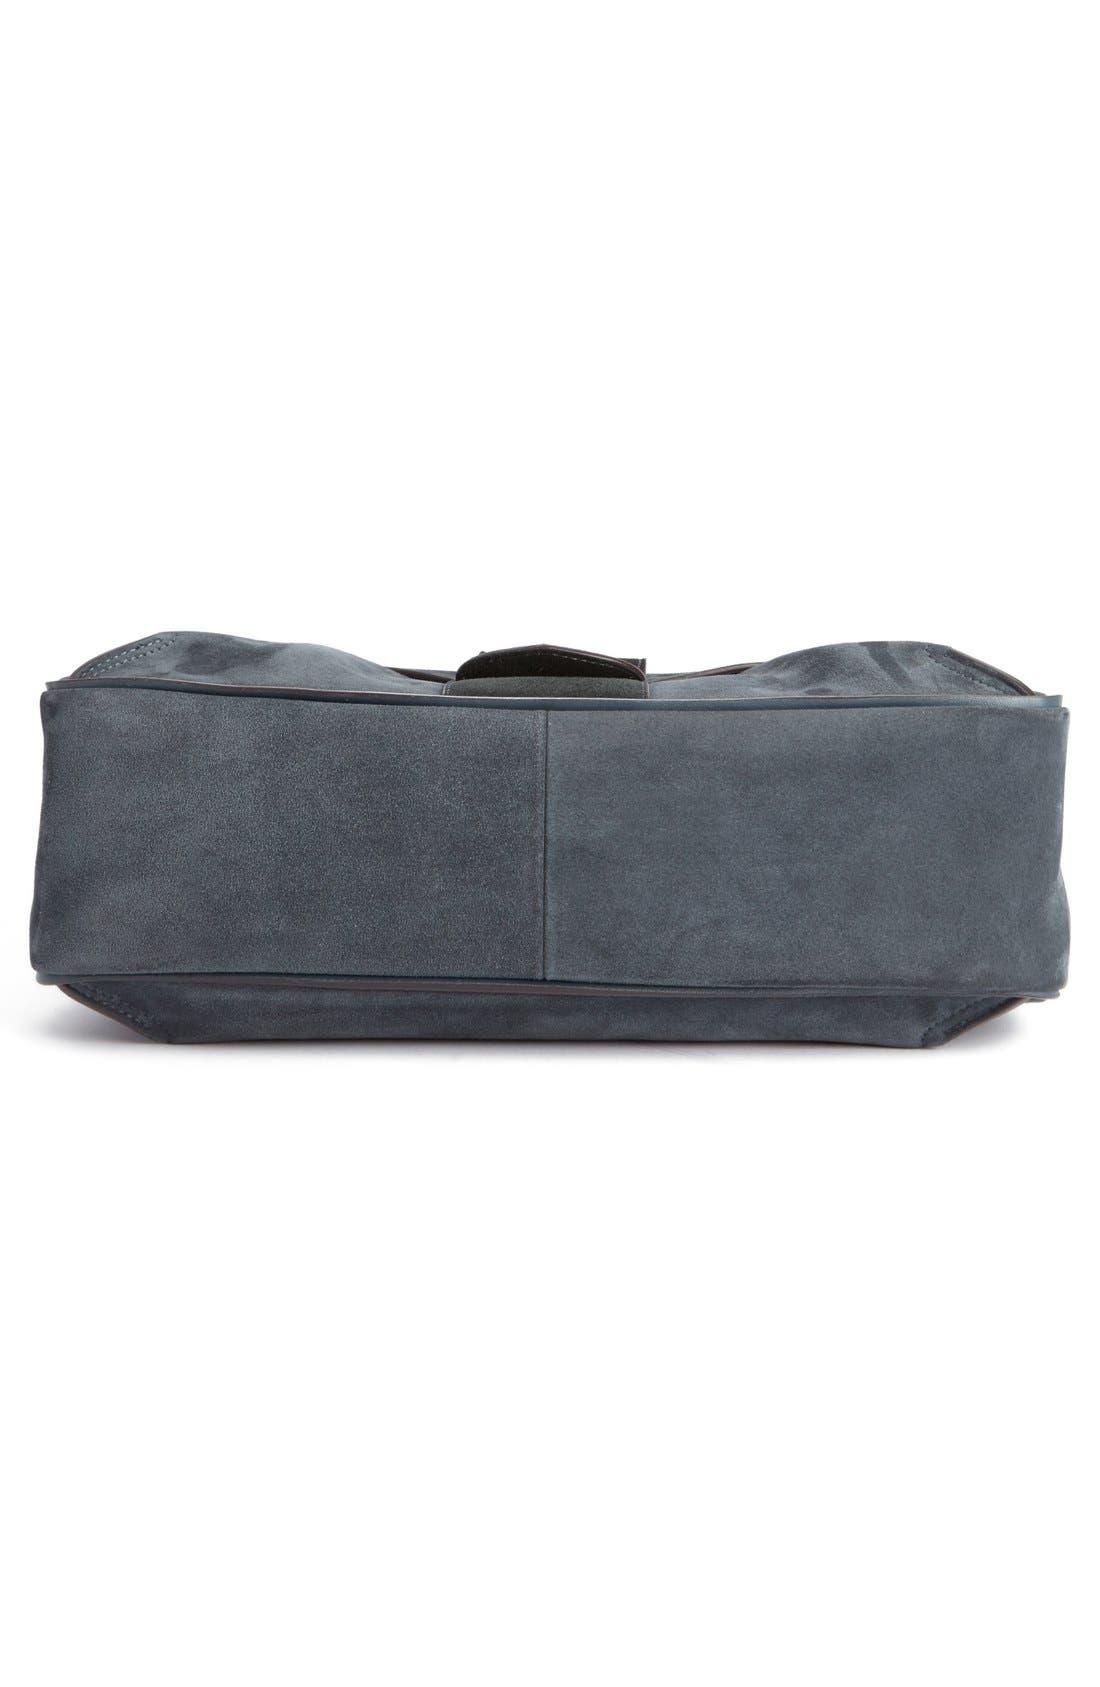 'Medium Lexa' Suede Shoulder Bag,                             Alternate thumbnail 5, color,                             043